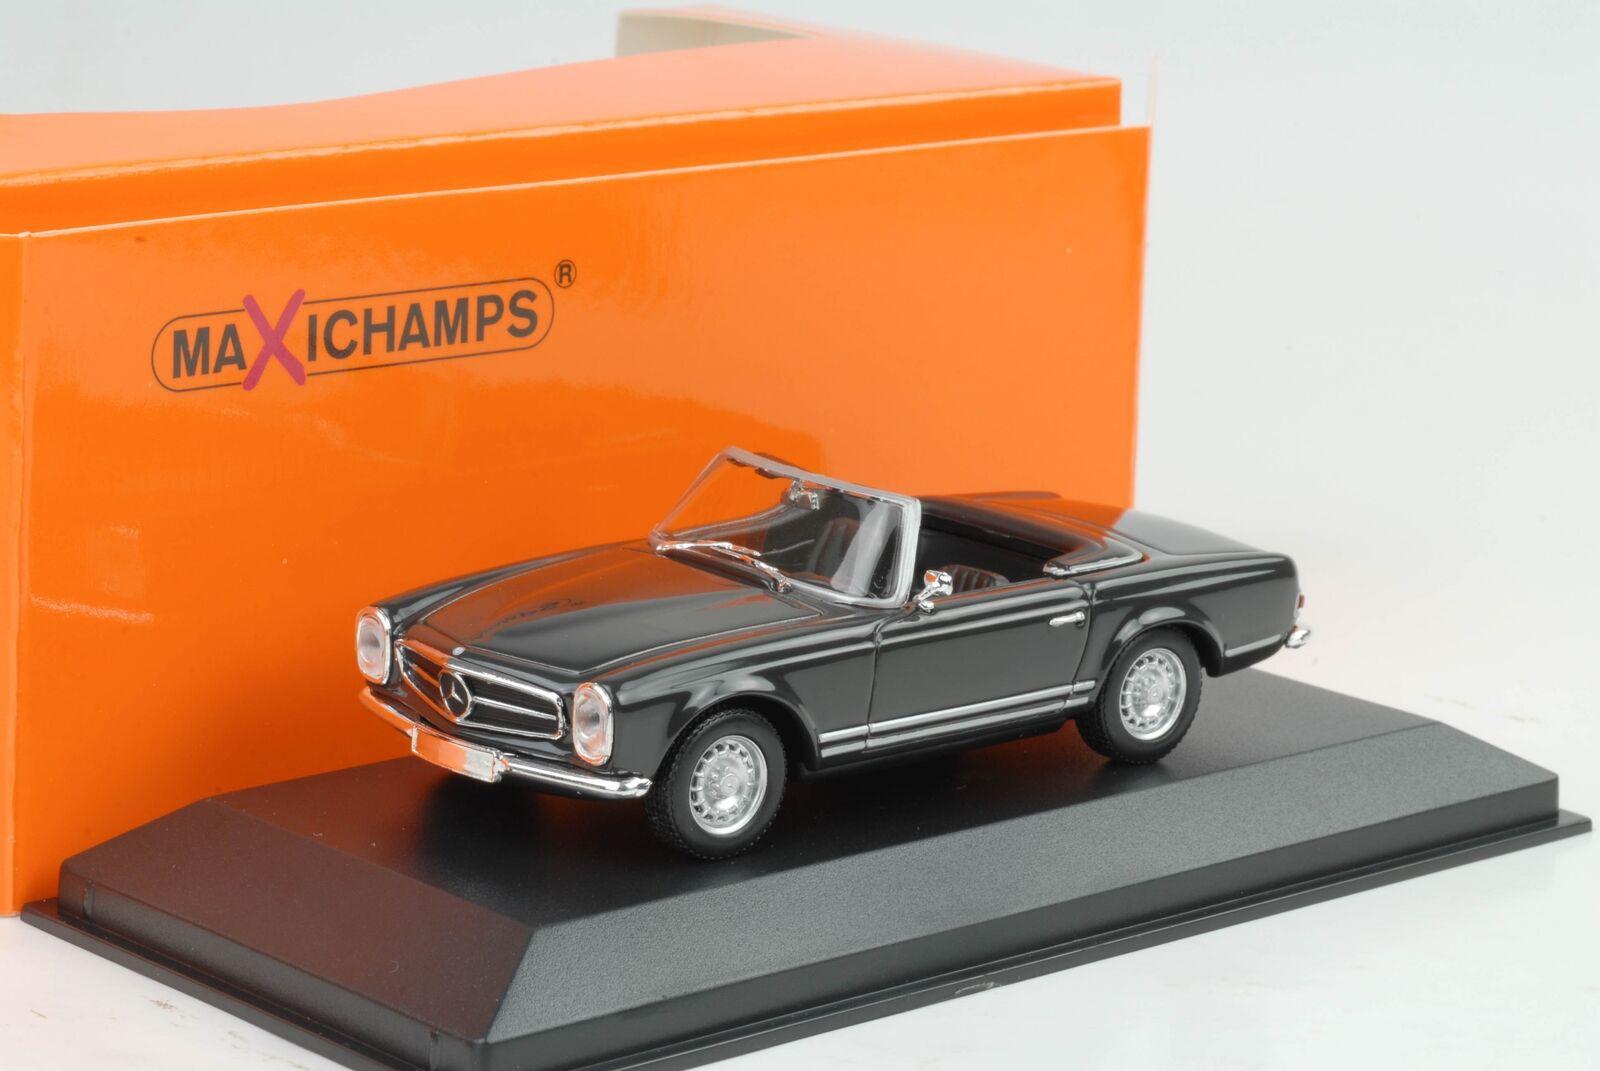 1965 mercedes-benz mercedes-benz mercedes-benz 230 sl w113 gris 1 43 maxichamps Minichamps be5ad9